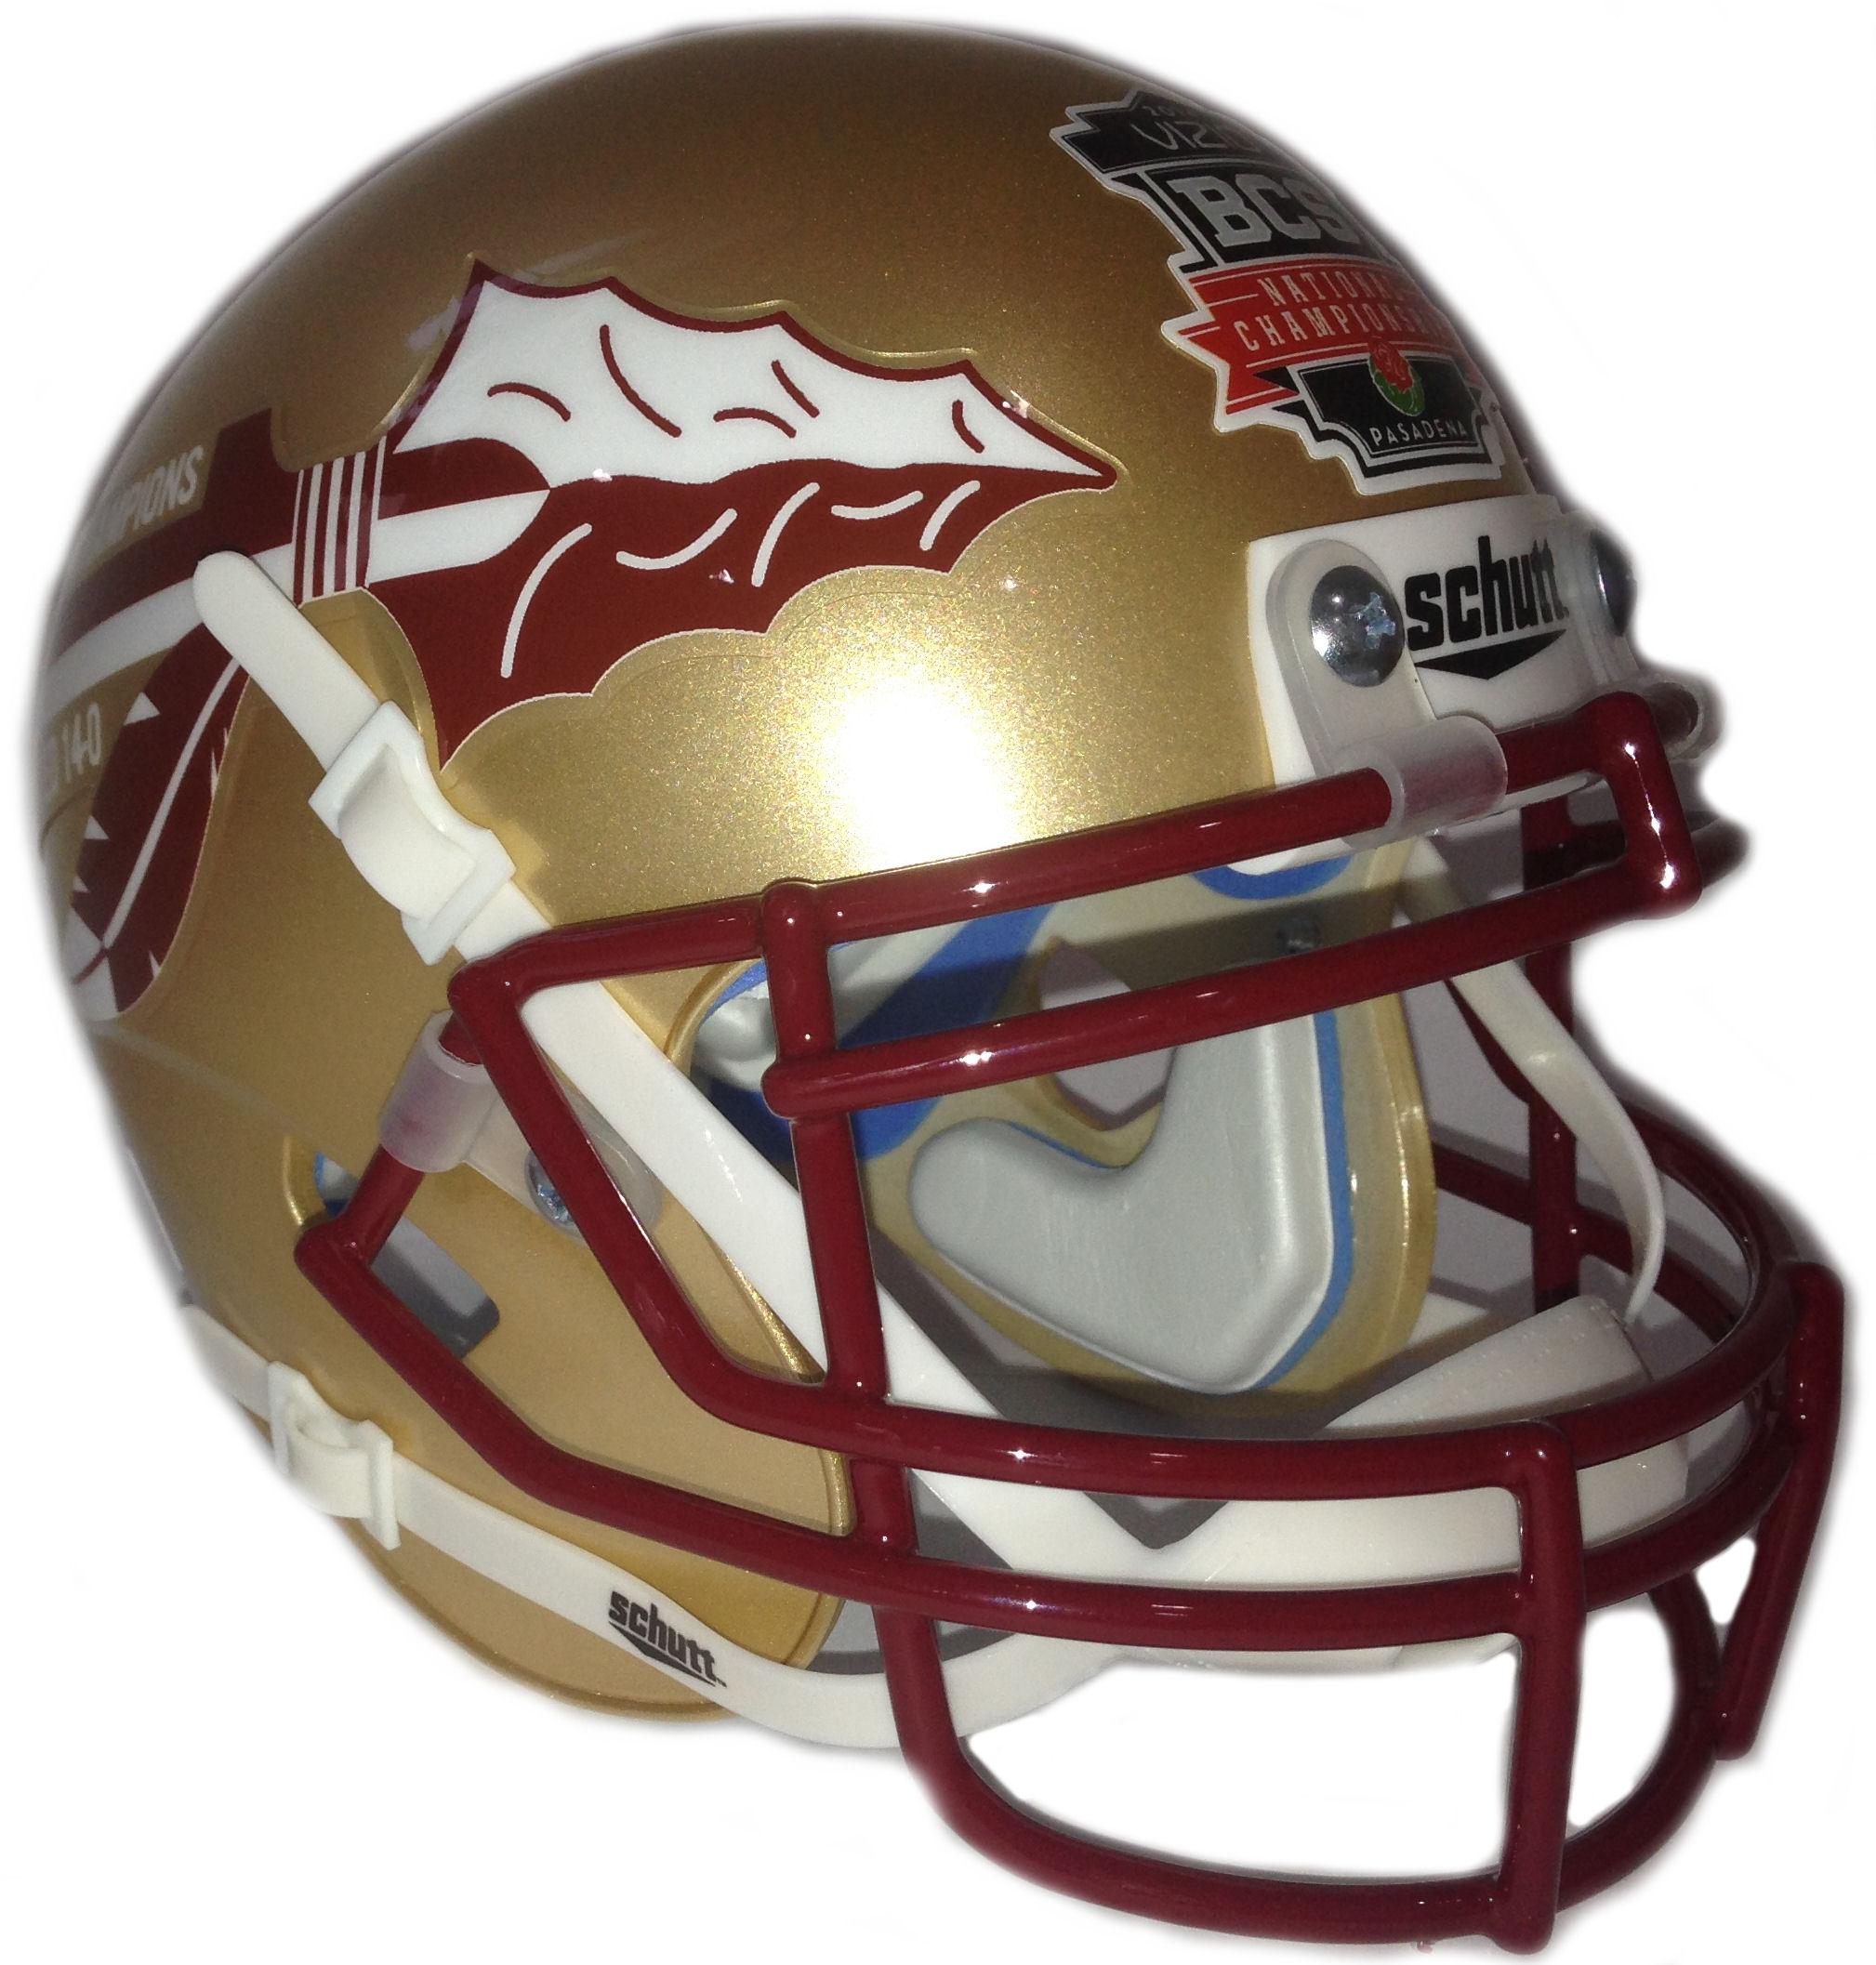 Florida State Seminoles 2013 BCS National Champions Authentic College XP Football Helmet Schutt